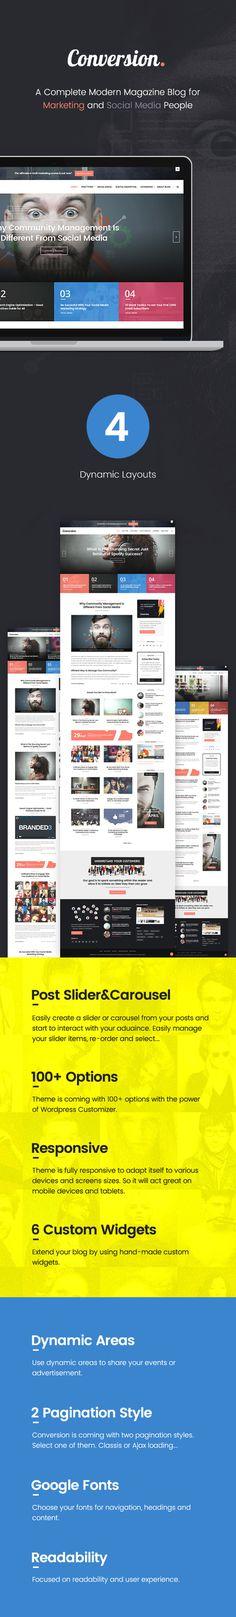 Ultimate Conversion – Digital Marketing Magazine